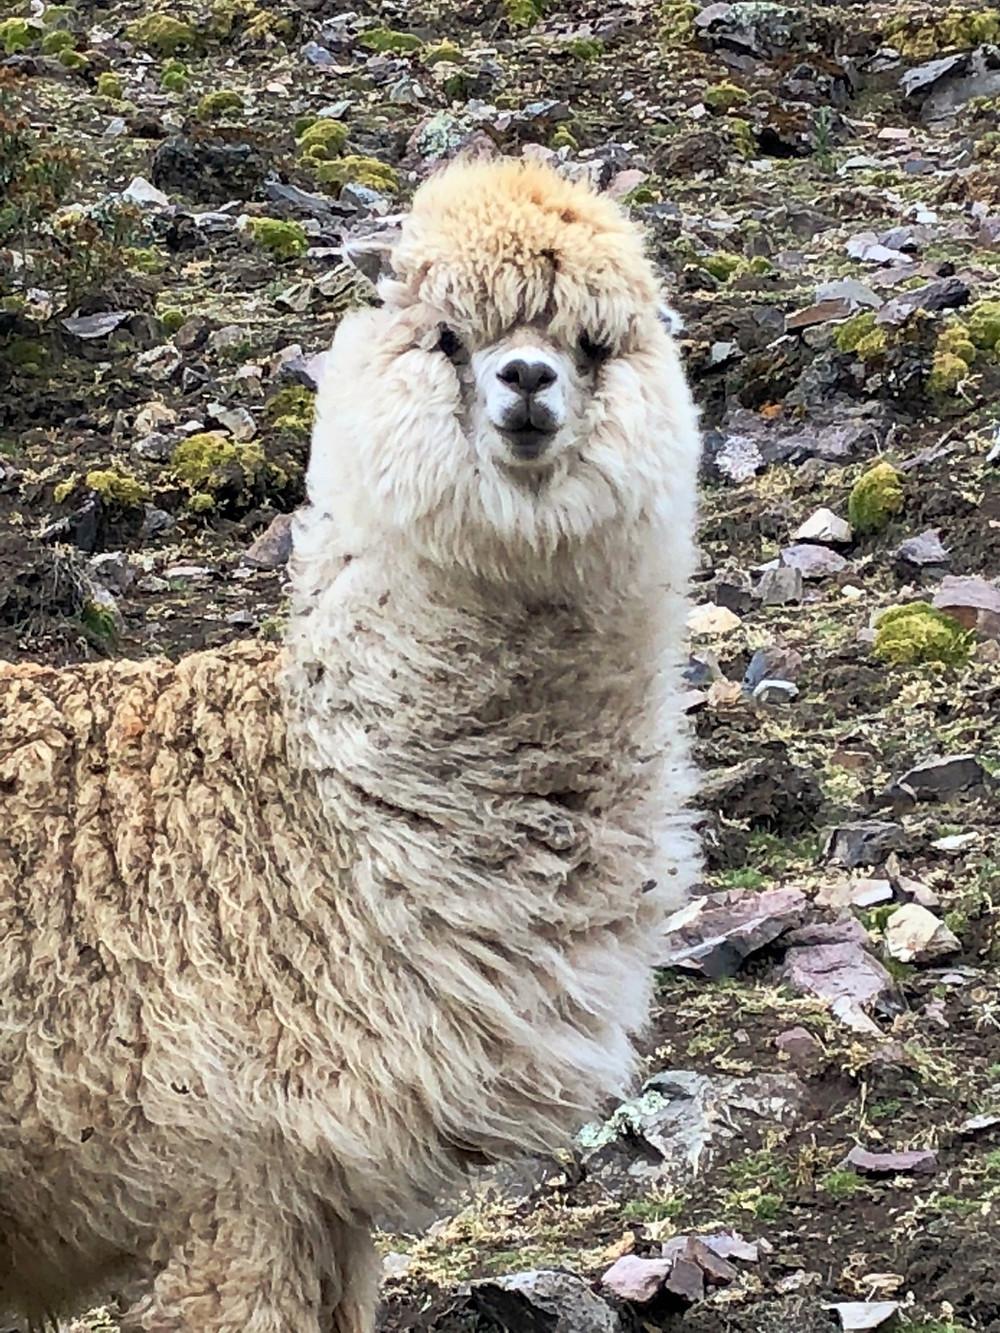 Wild alpaca, Sacred Valley, Peru - photo credit: www.paradoxtravel.com